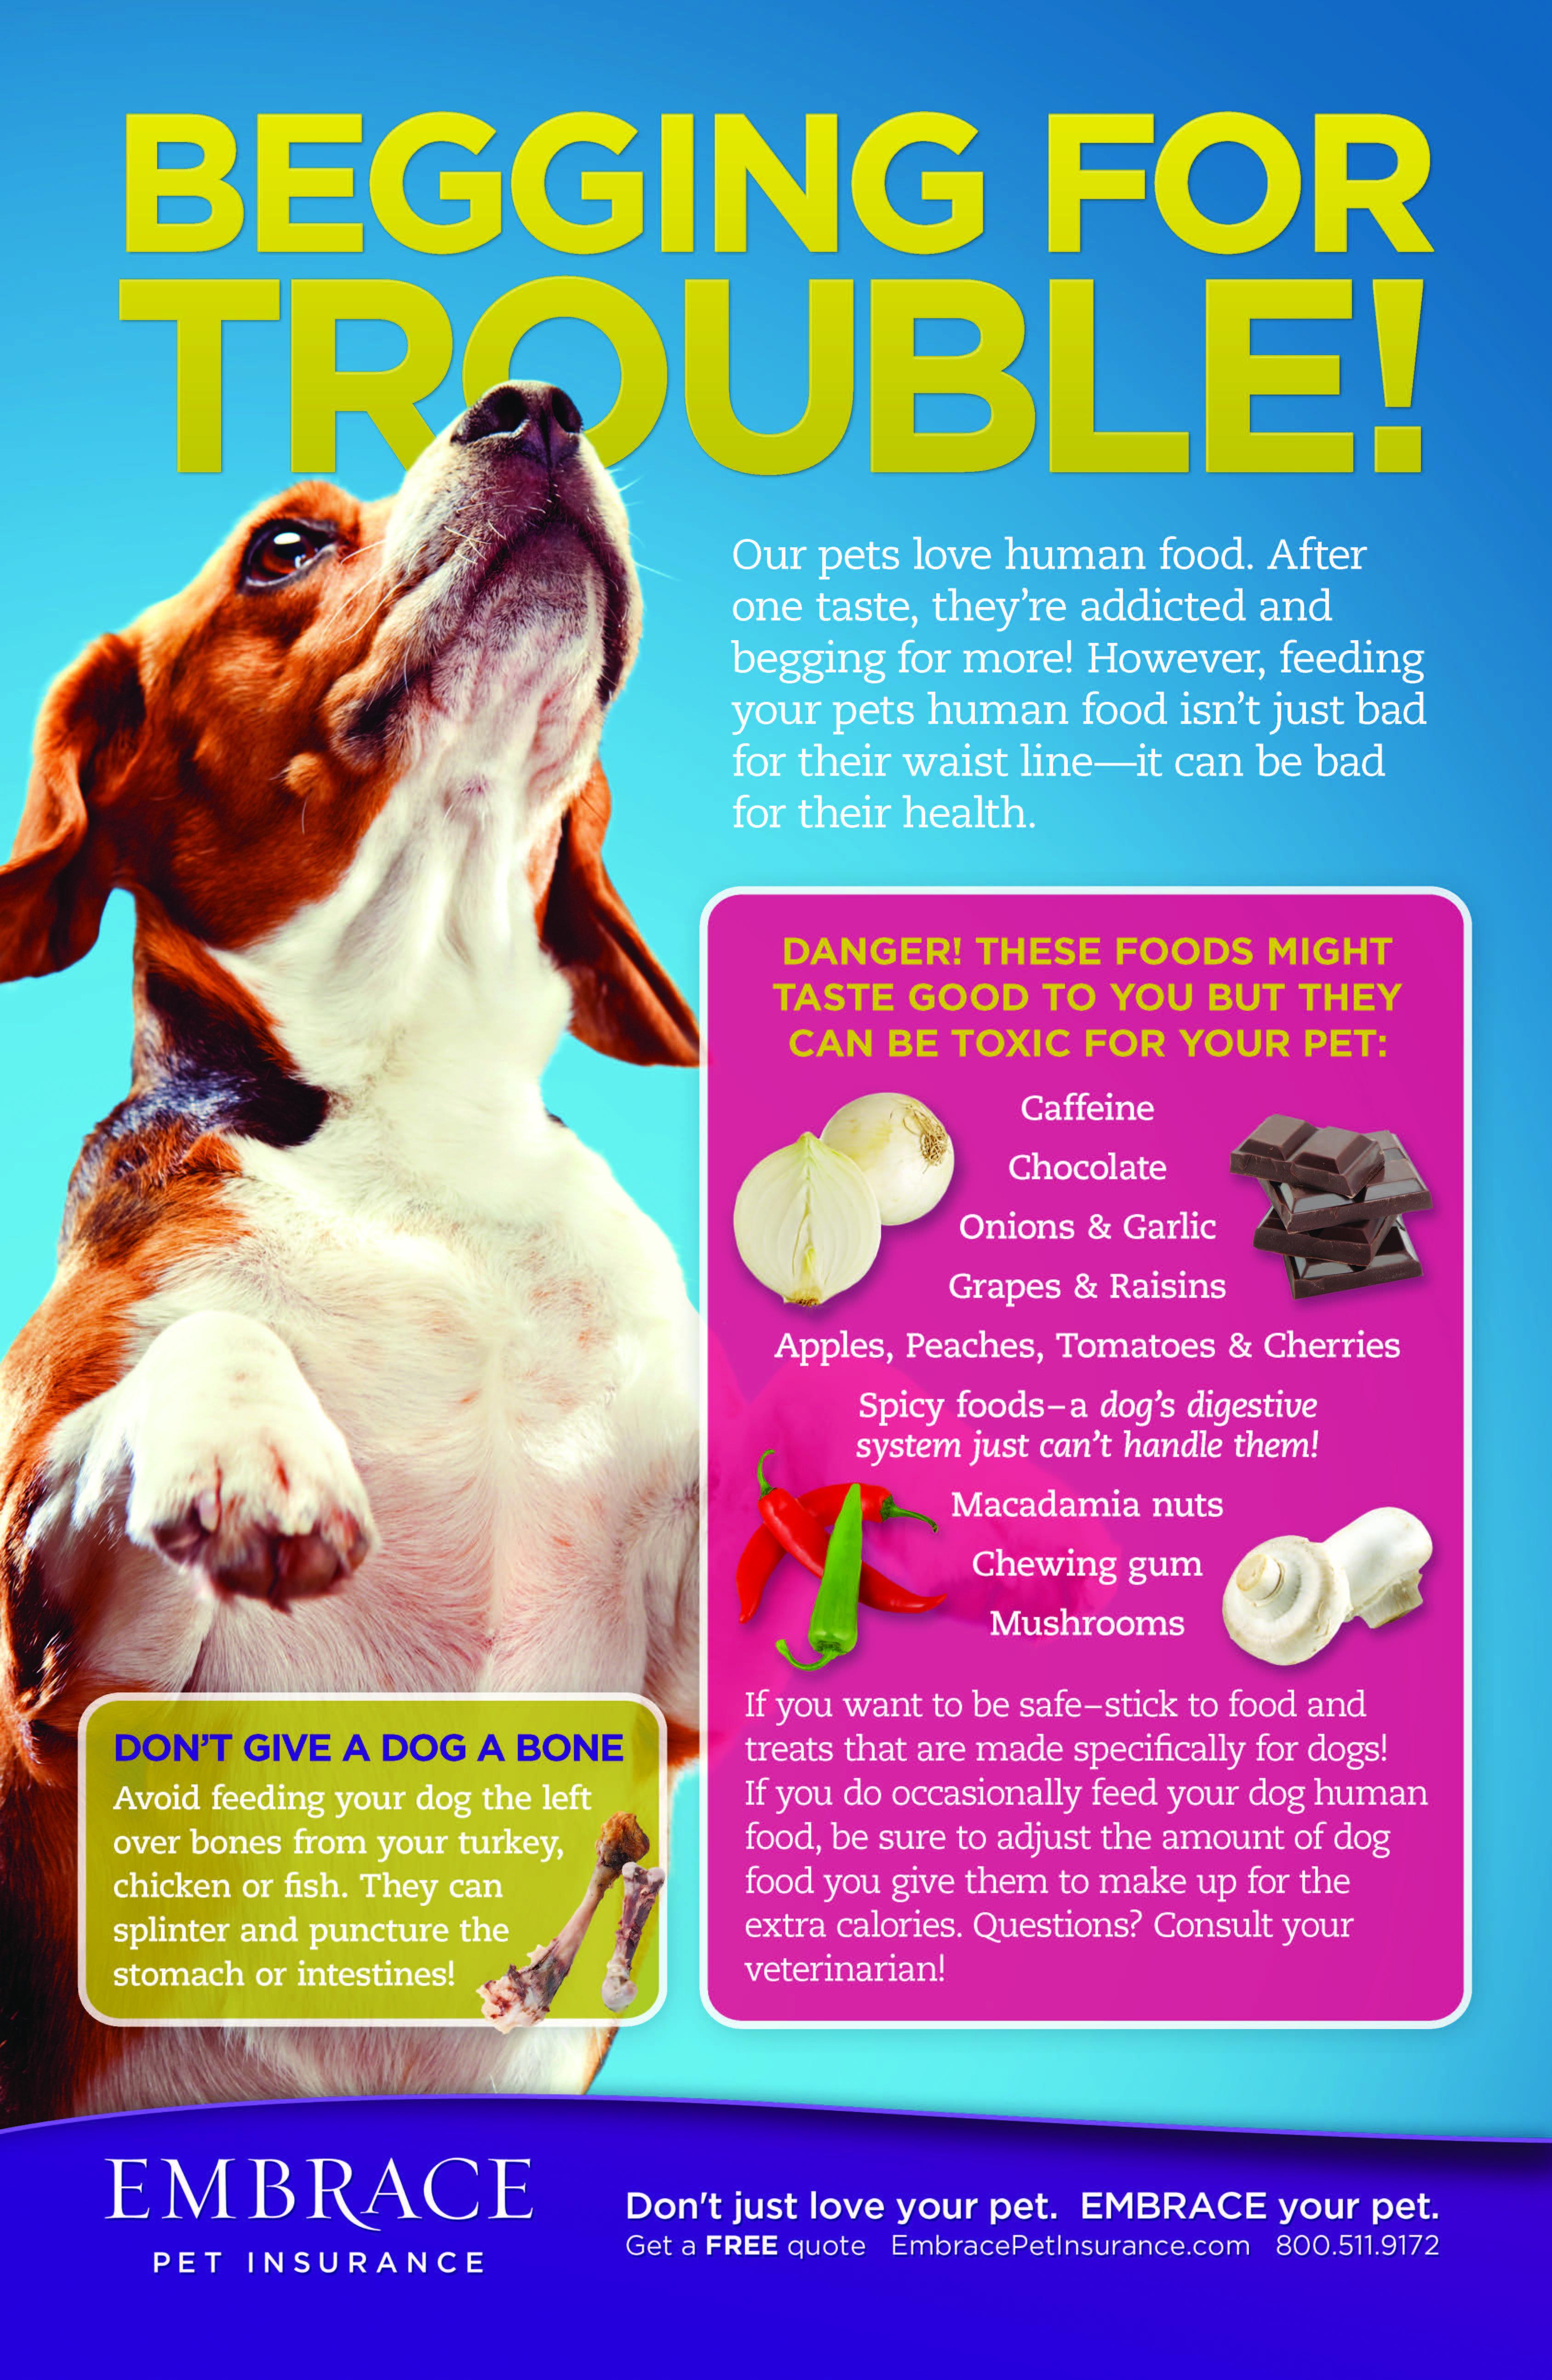 Pin By Sara Radak On Puppy Love Pet Health Cat Health Dog Care